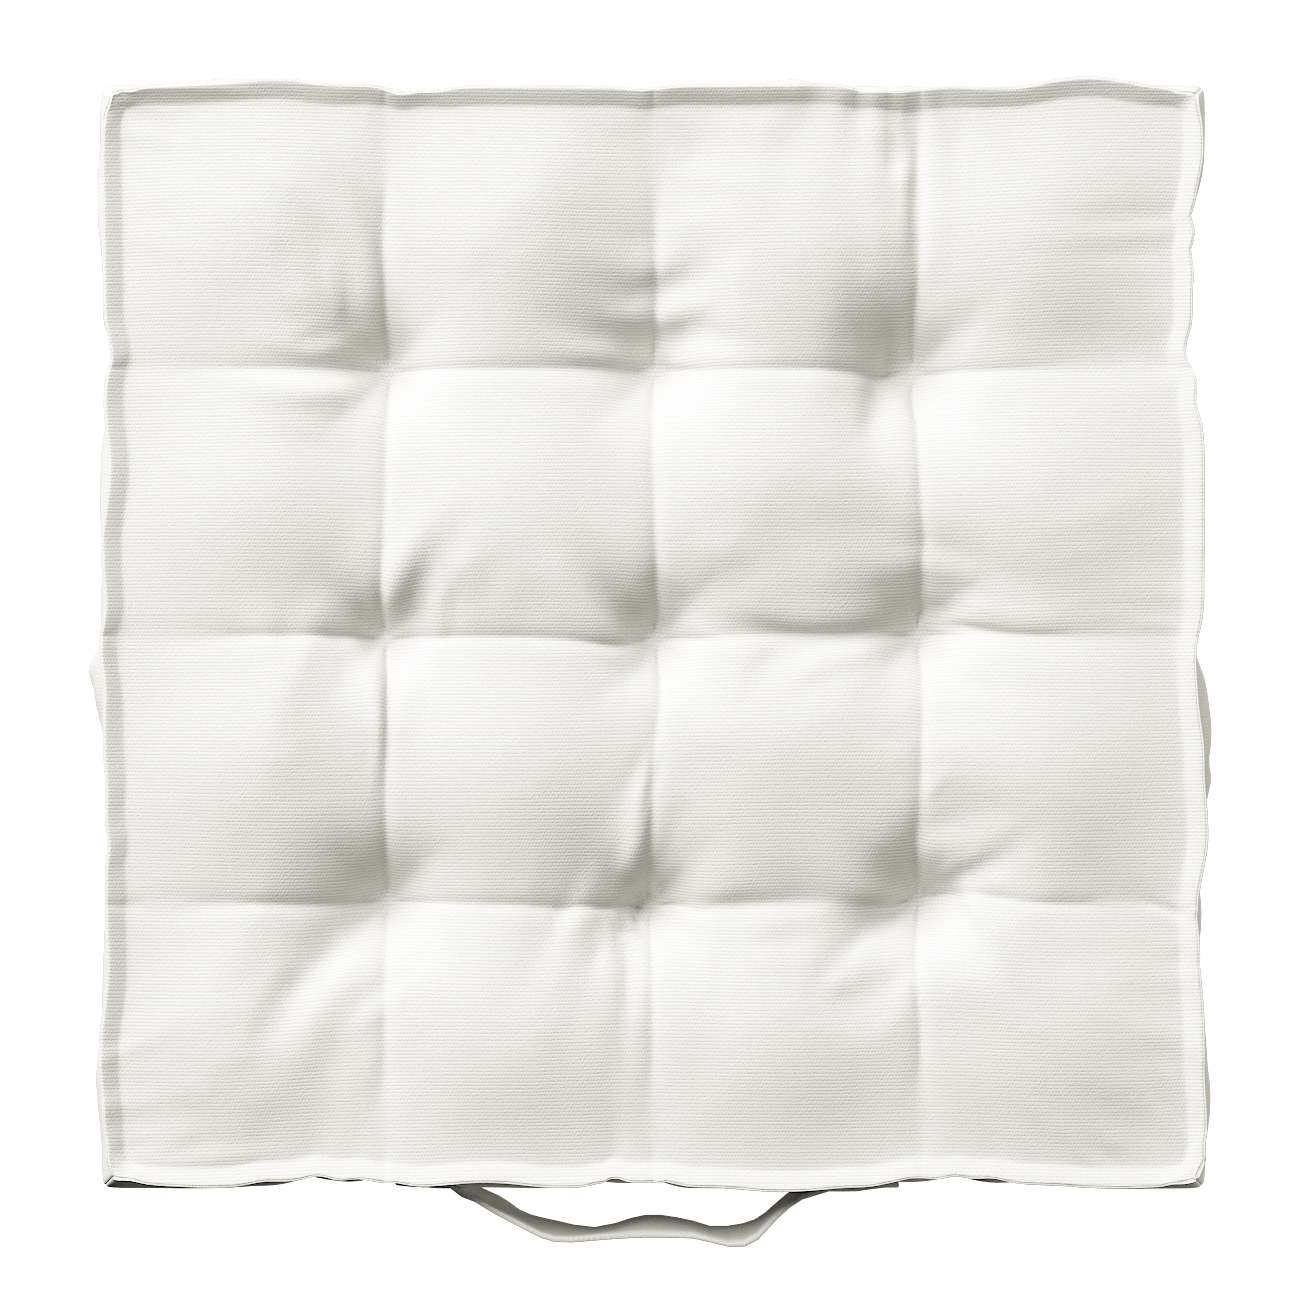 Stolehynde Jacob fra kollektionen Cotton Panama, Stof: 702-34